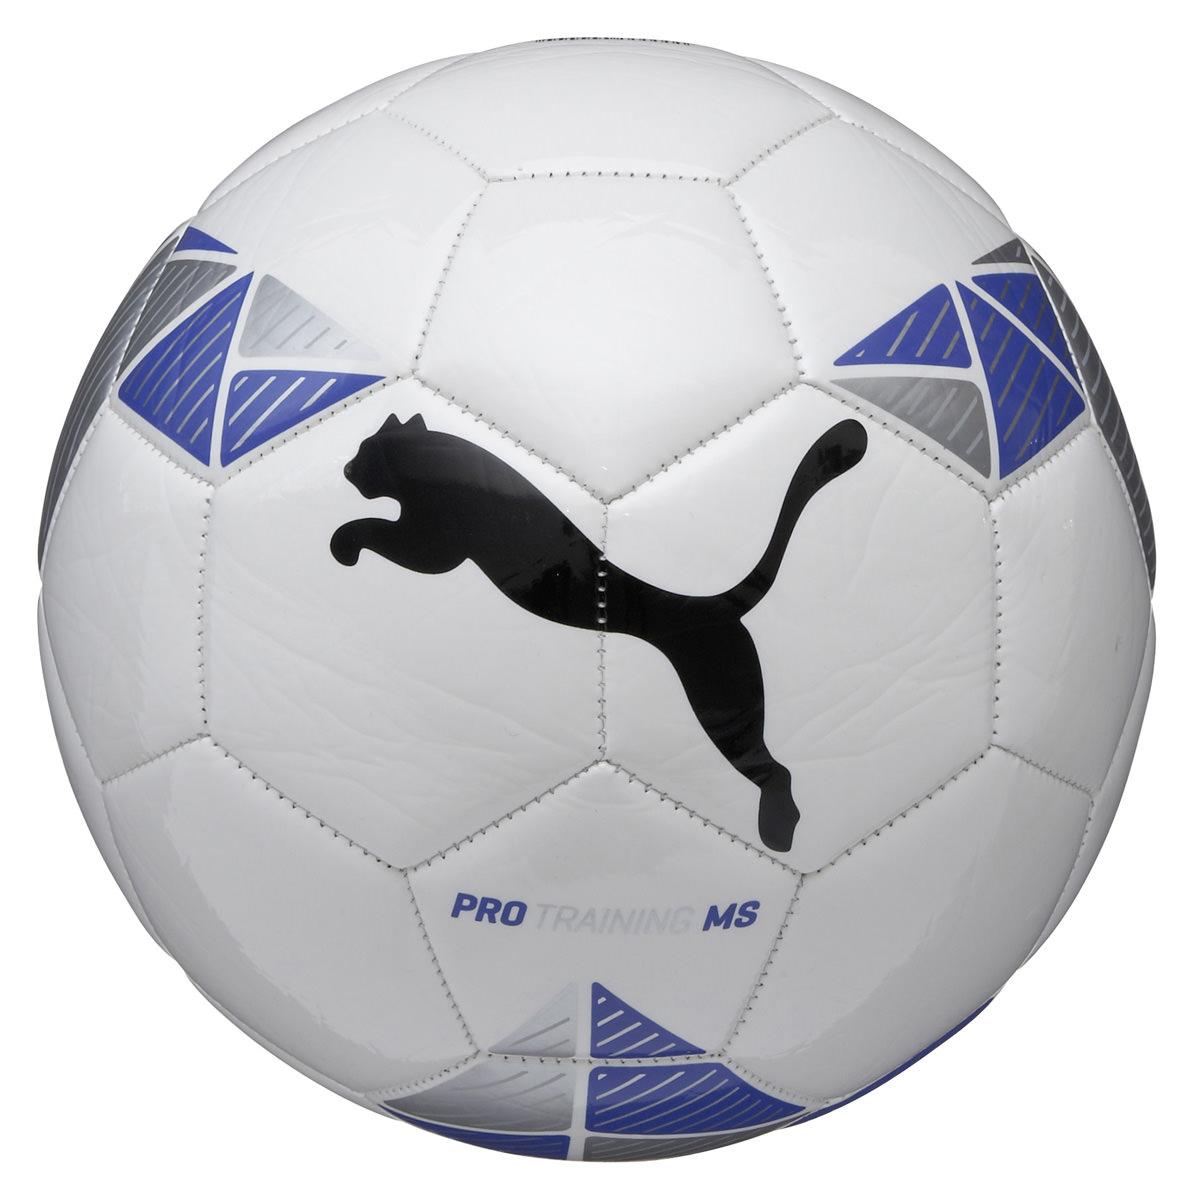 Puma Pro Training MS Football - White-Blue